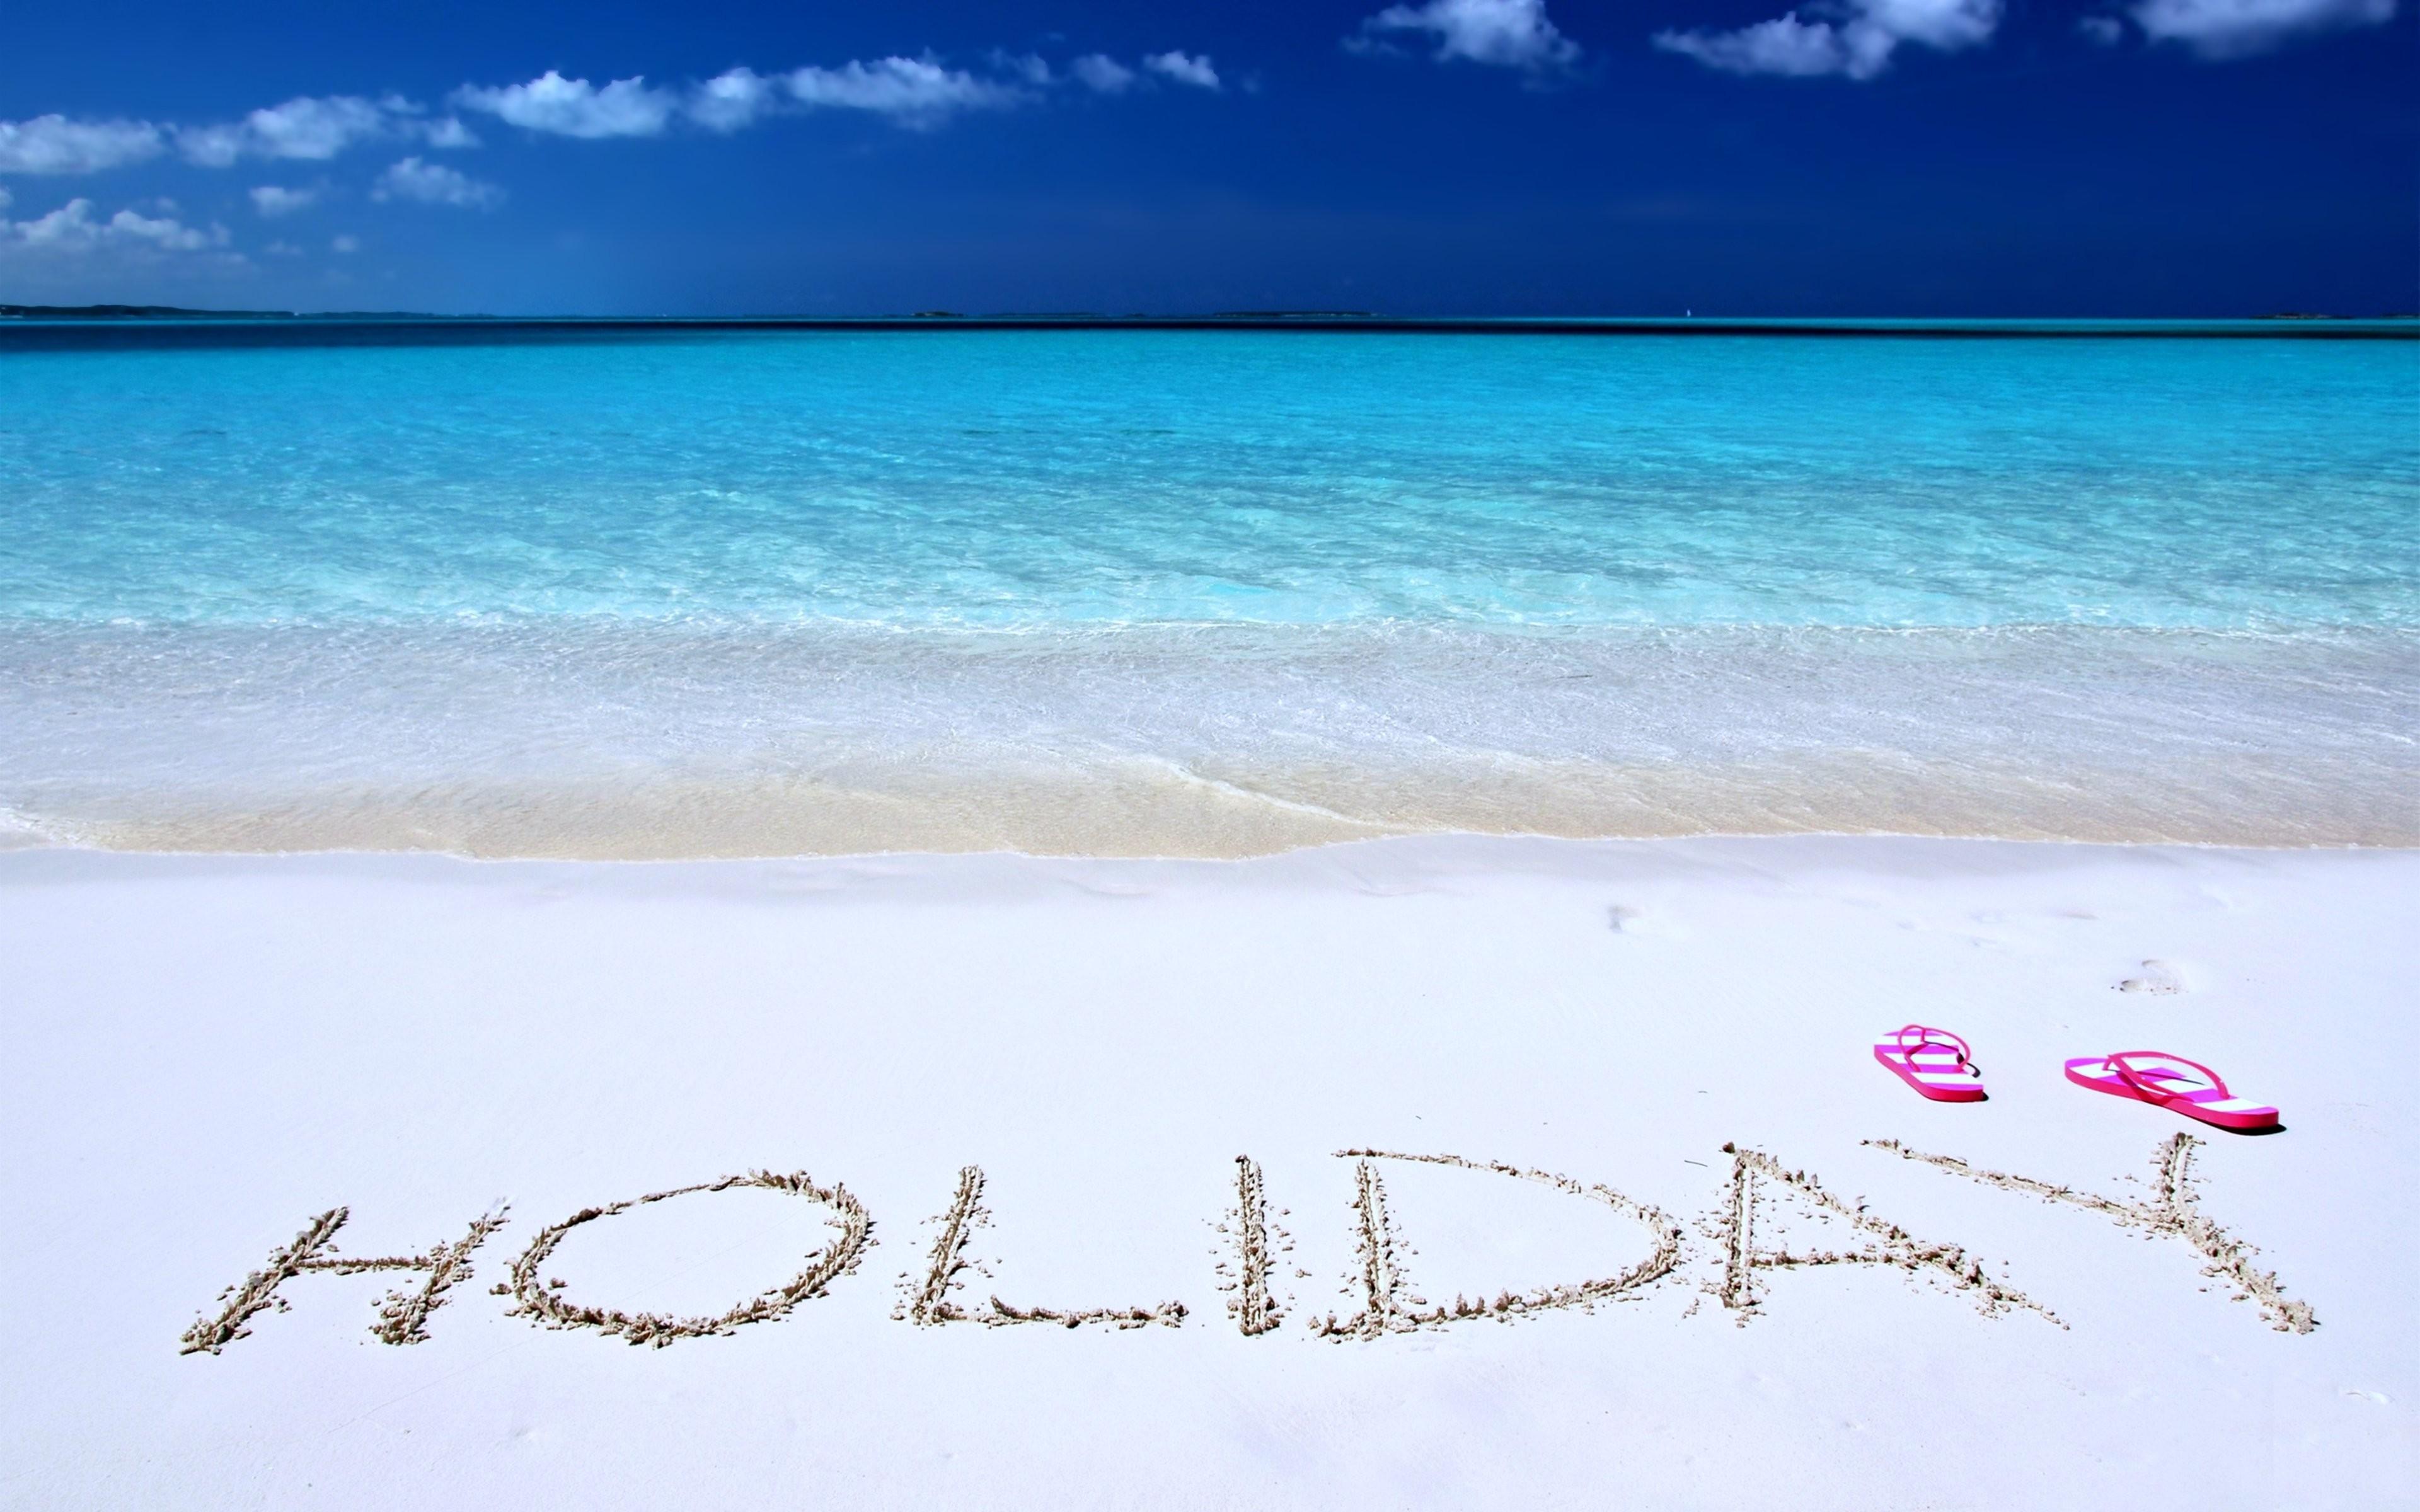 Iphone Swim Happy Enjoy Skydownloadsea Summer Background 3840x2400